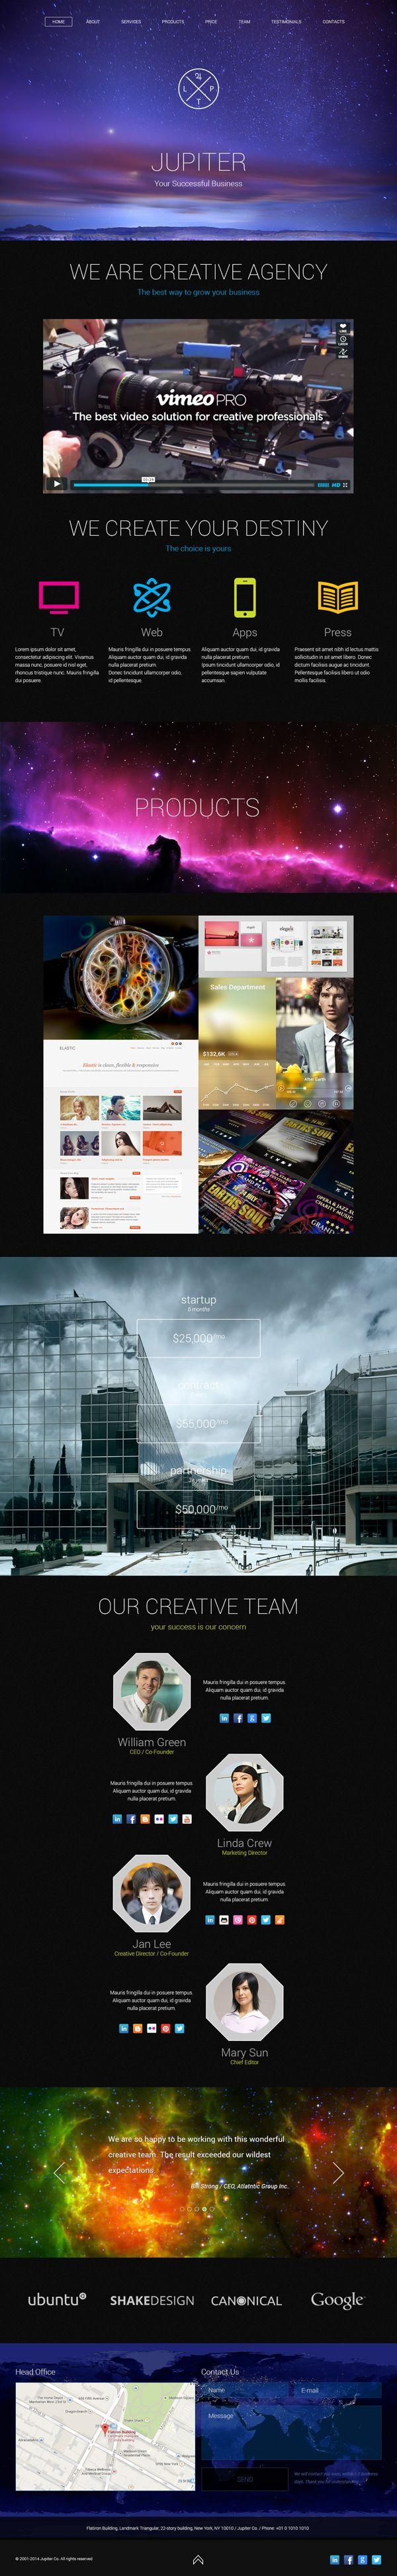 Jupiter Creative Agency. One Page PSD Template. by Antonina Osipenko, via Behance